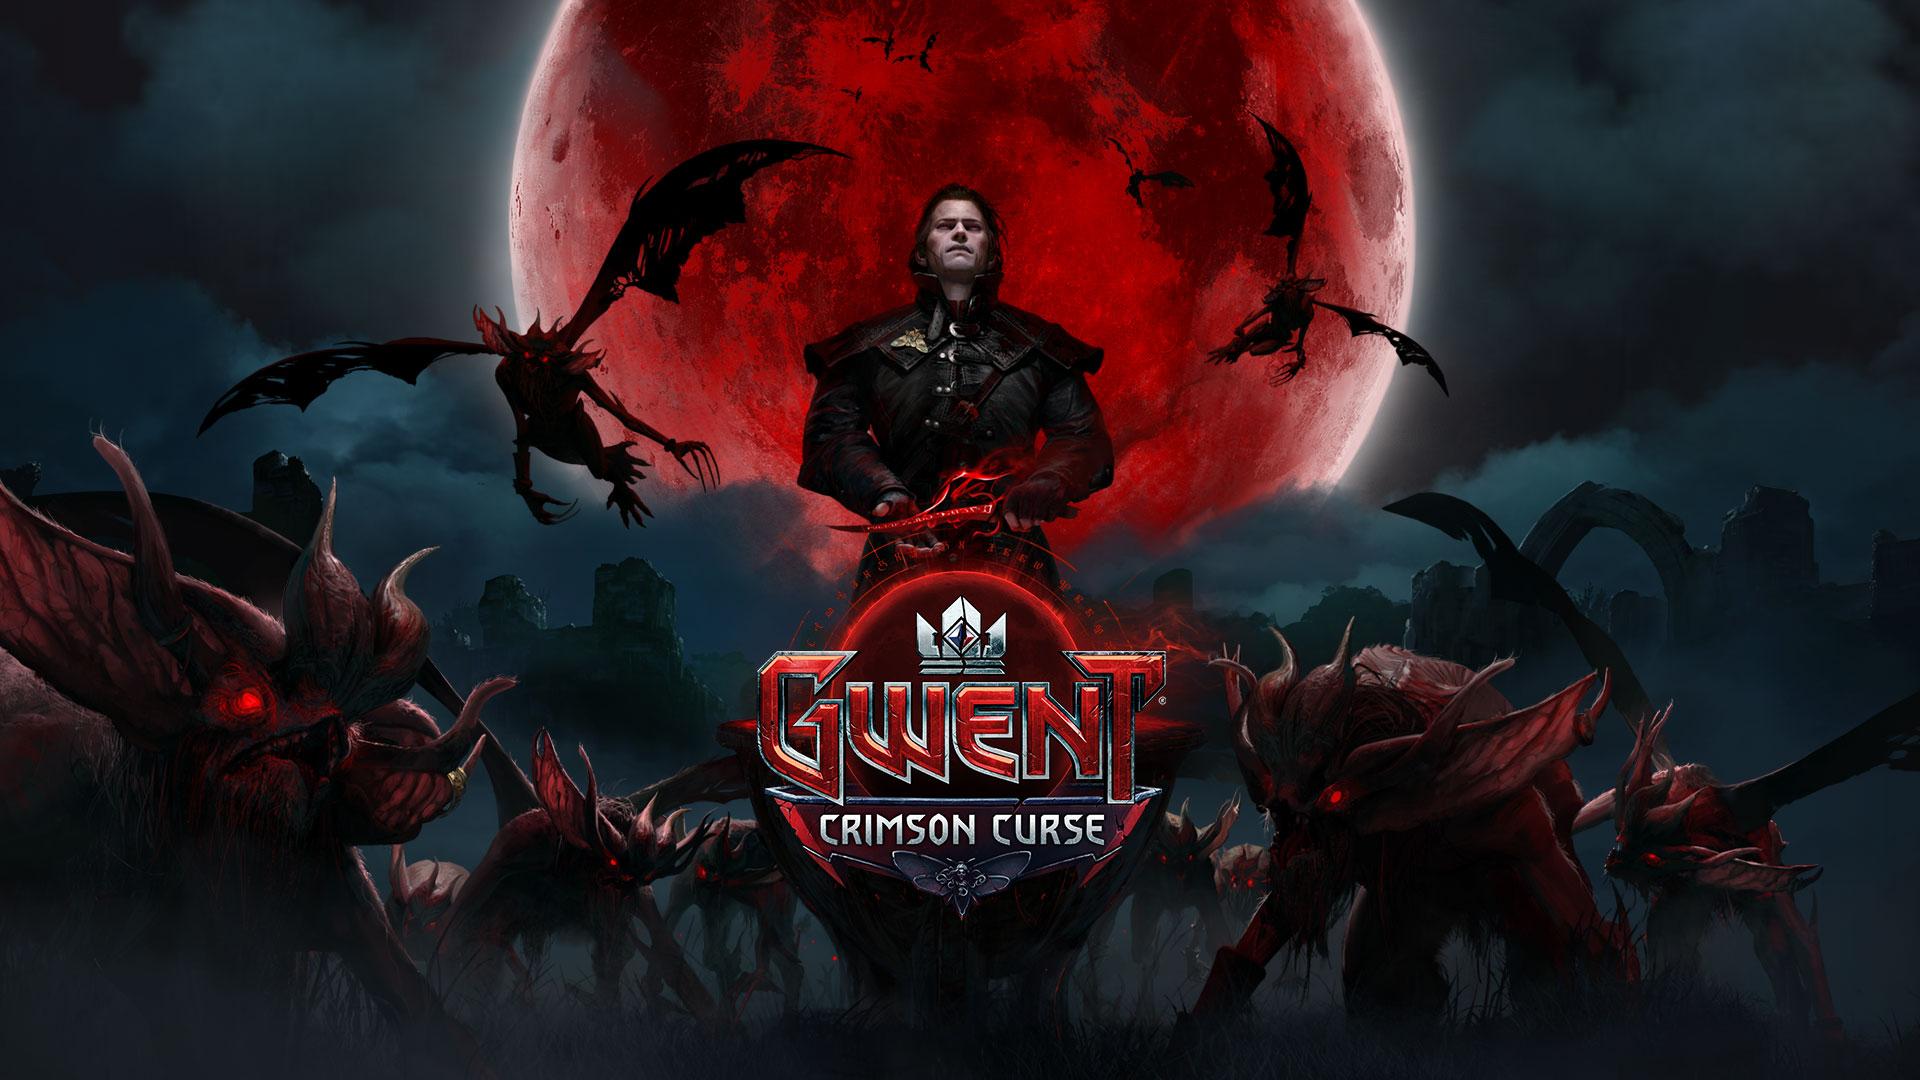 Crimson_Curse_1920x1080_EN.jpg